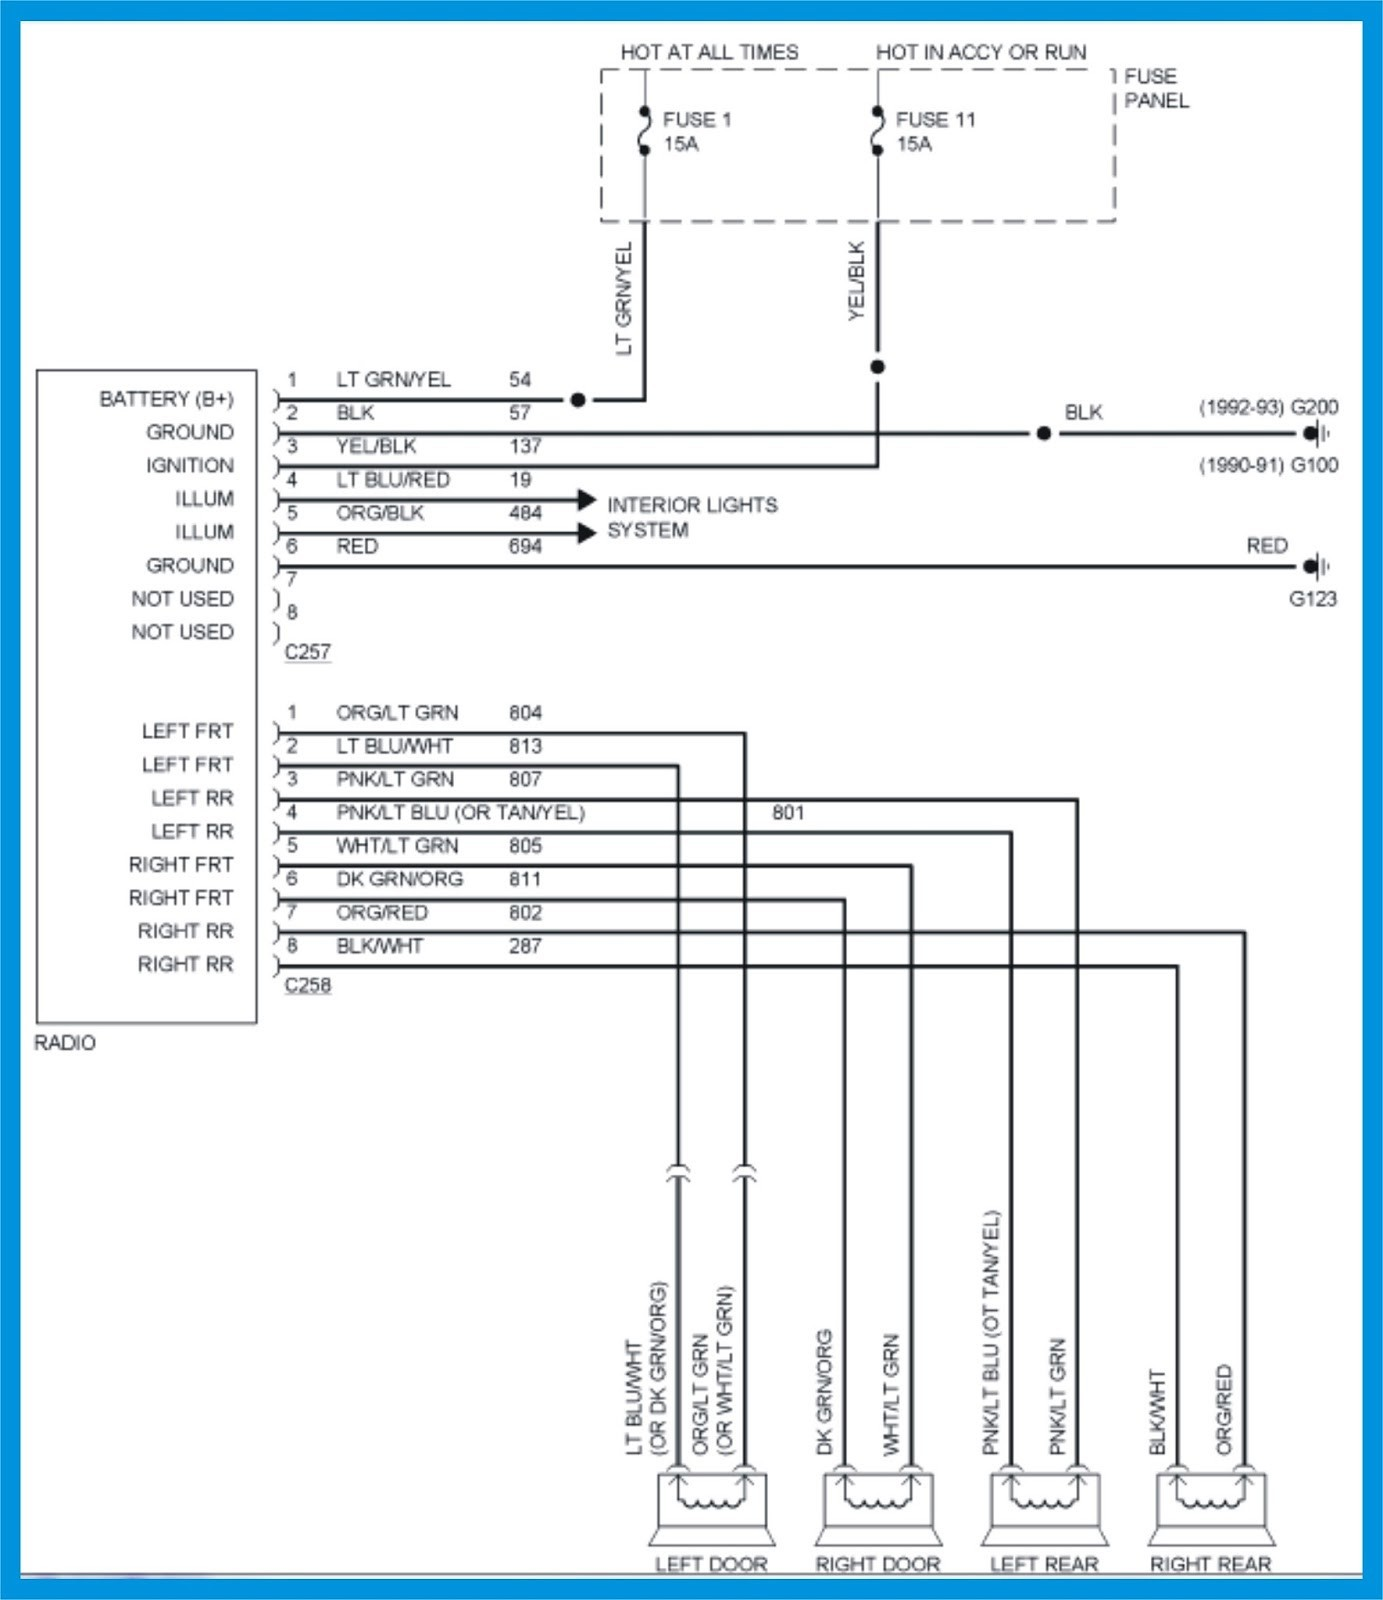 2011 ford ranger radio wiring diagram all wiring diagram ford ranger stereo wire colors ford ranger radio wiring diagram wiring diagrams best ford ranger trailer wiring diagram 2011 ford ranger radio wiring diagram